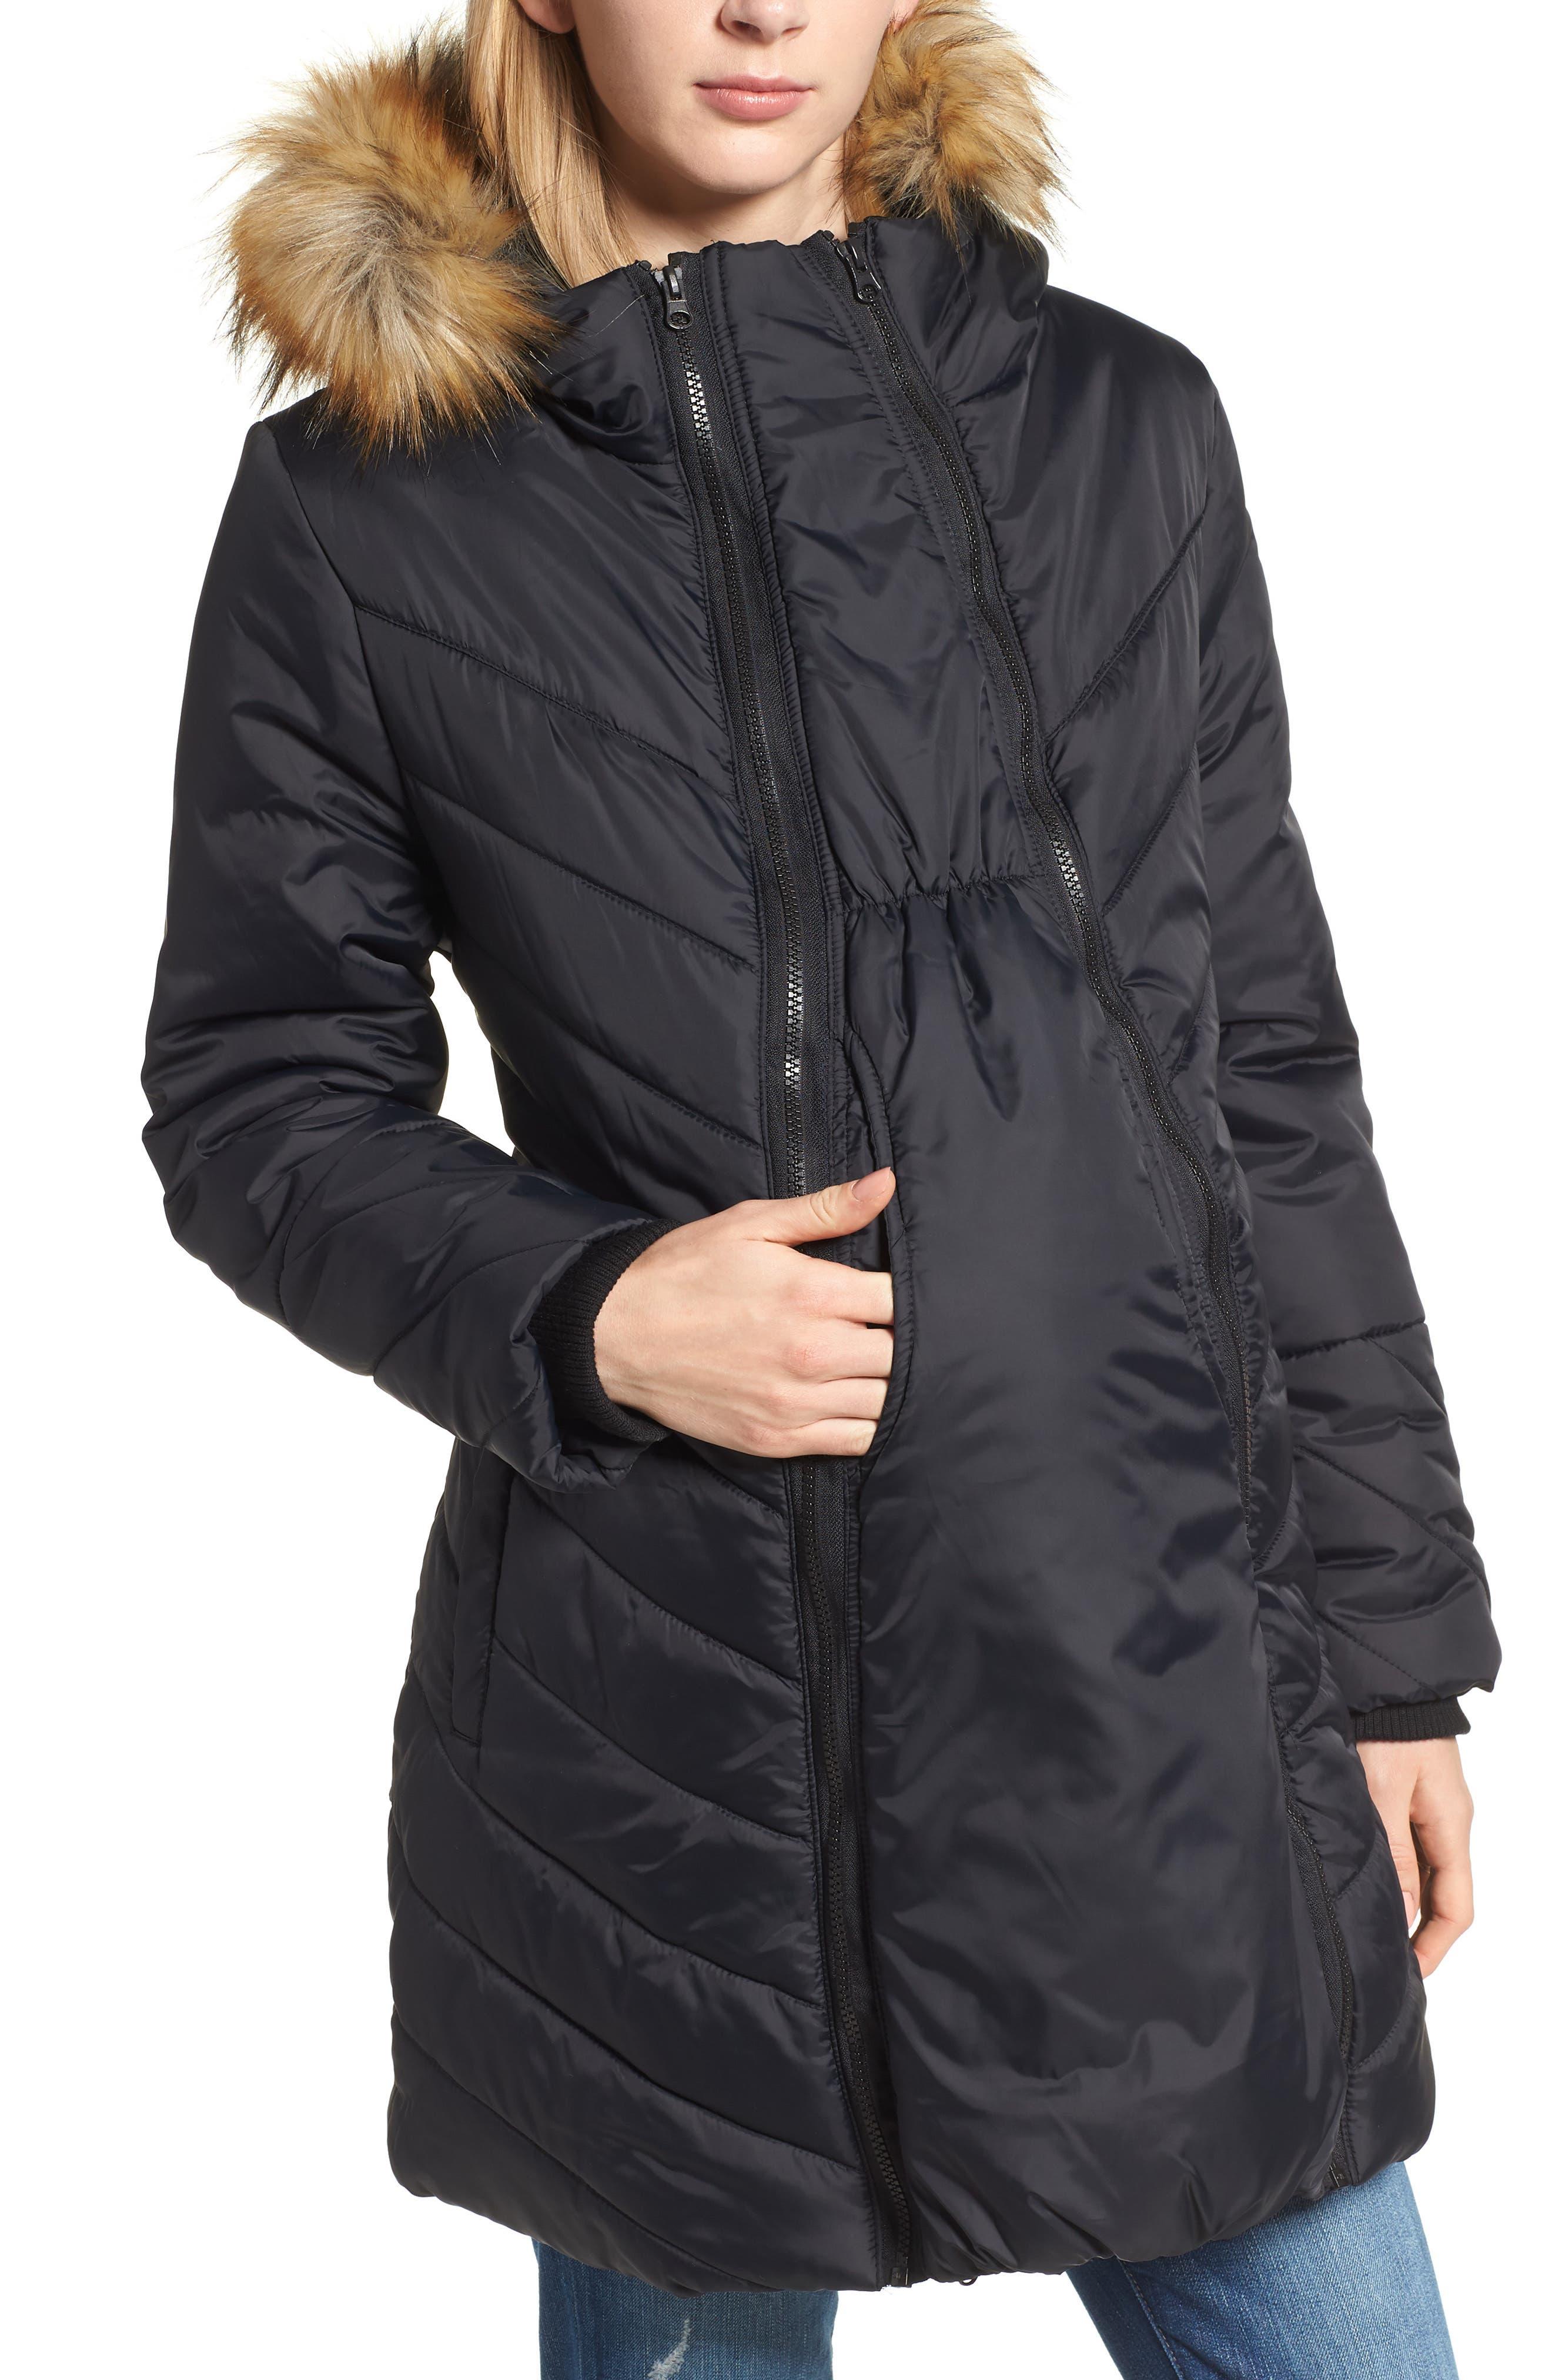 Faux Fur Trim Convertible Puffer 3-in-1 Maternity Jacket,                         Main,                         color, Black